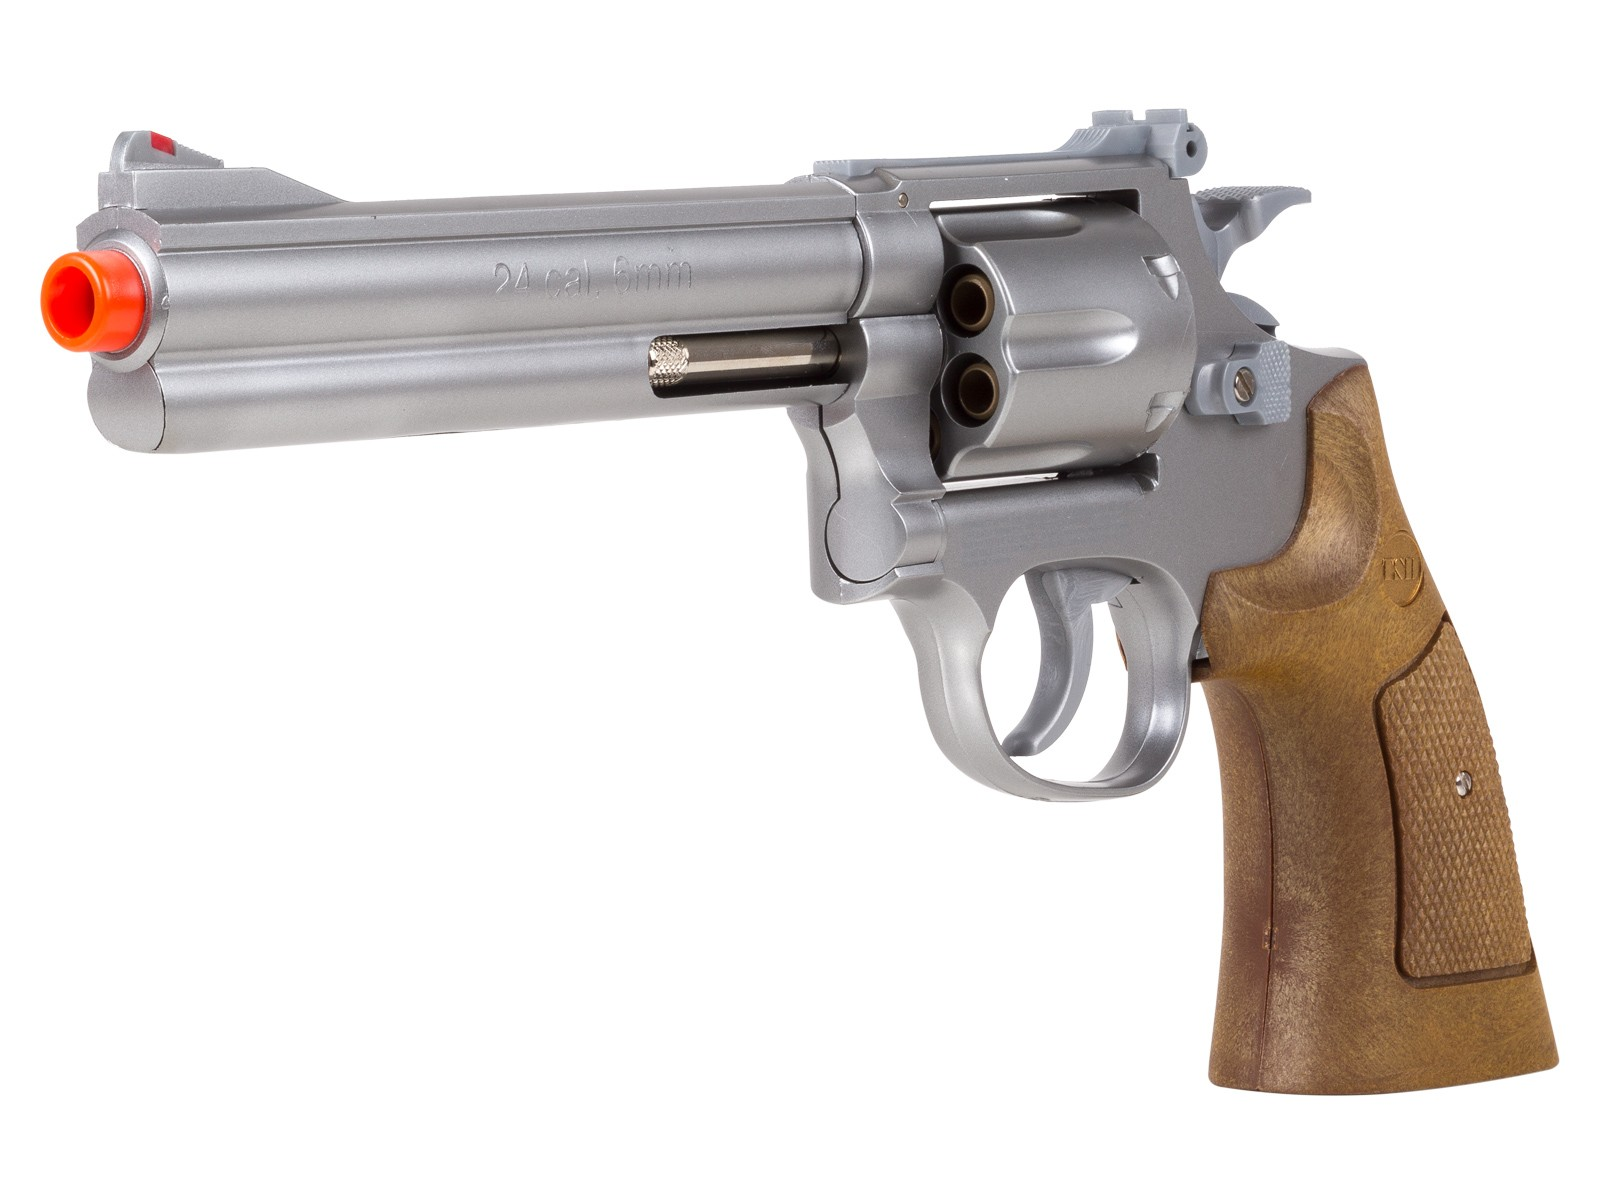 TSD_934_UHC_6_inch_revolver_SilverBrown_6mm